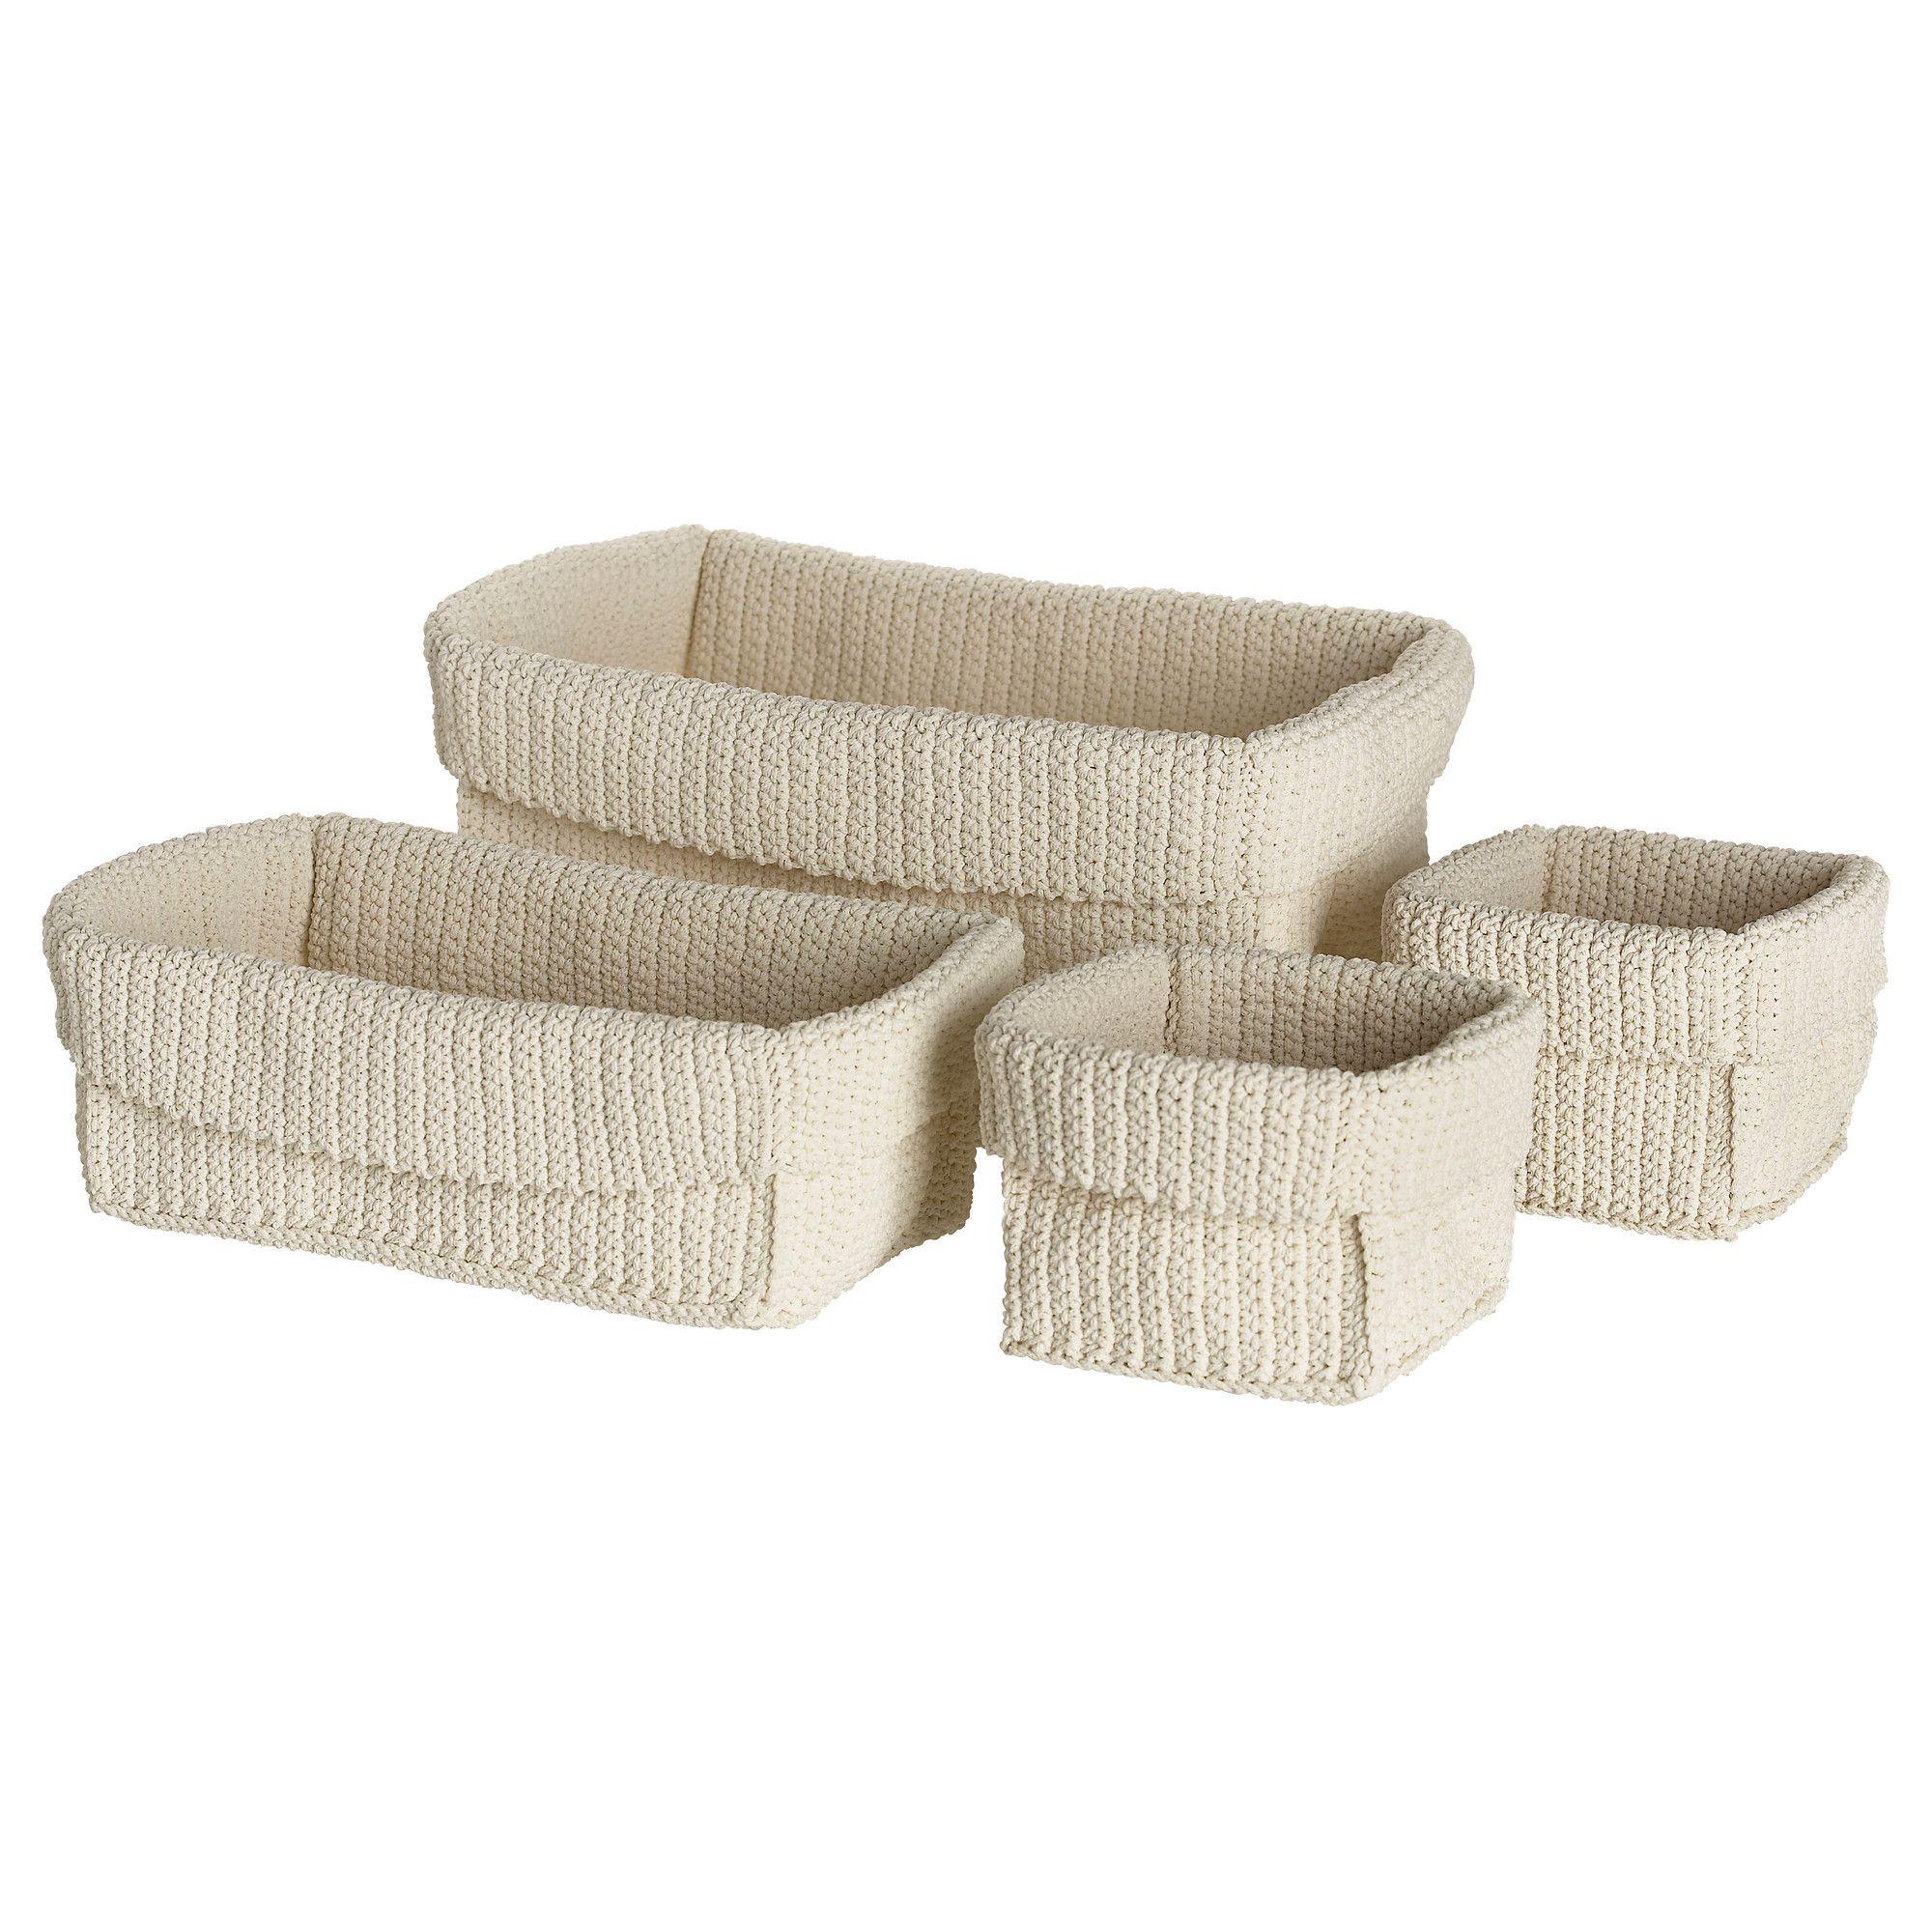 lidan basket set of 4 ikea bathroom storage 15 lost. Black Bedroom Furniture Sets. Home Design Ideas